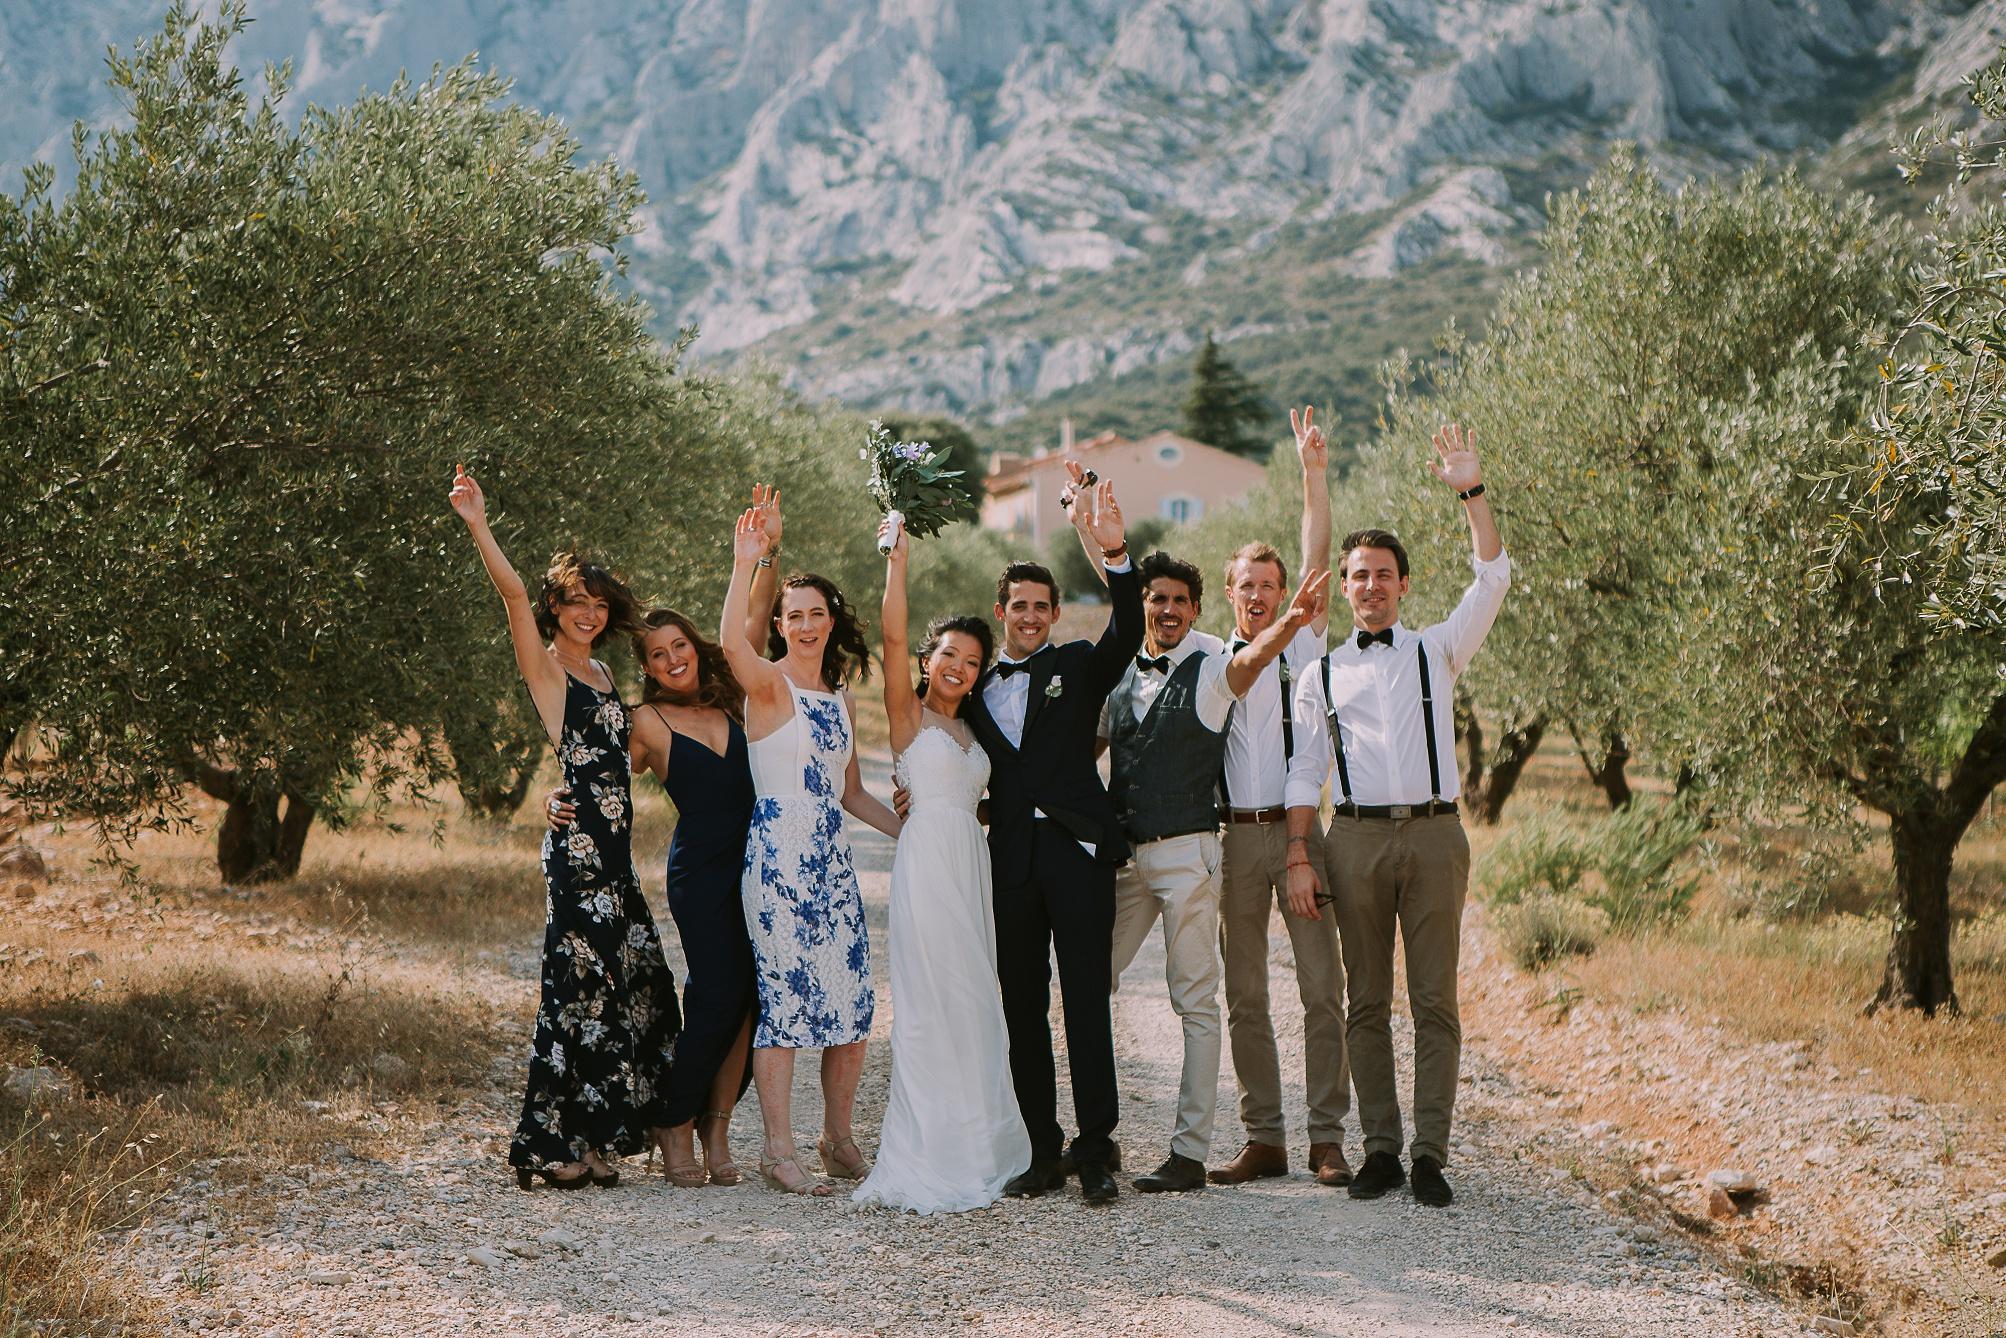 katerynaphotos-mariage-photographe-puyloubier-provence-aix-en-provence-sud-de-la-france_0389.jpg